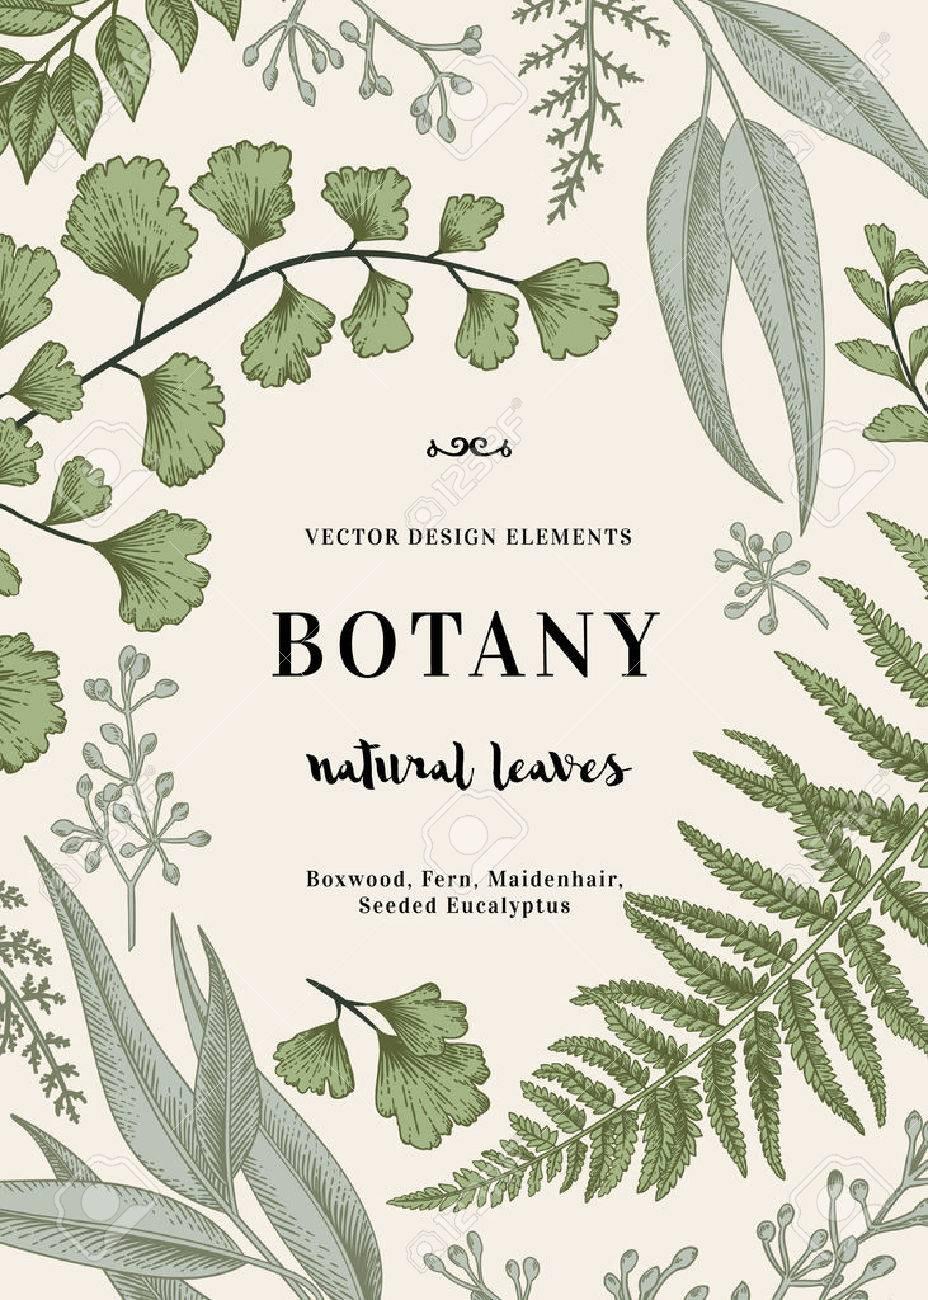 floral background vintage invitation with various leaves botanical